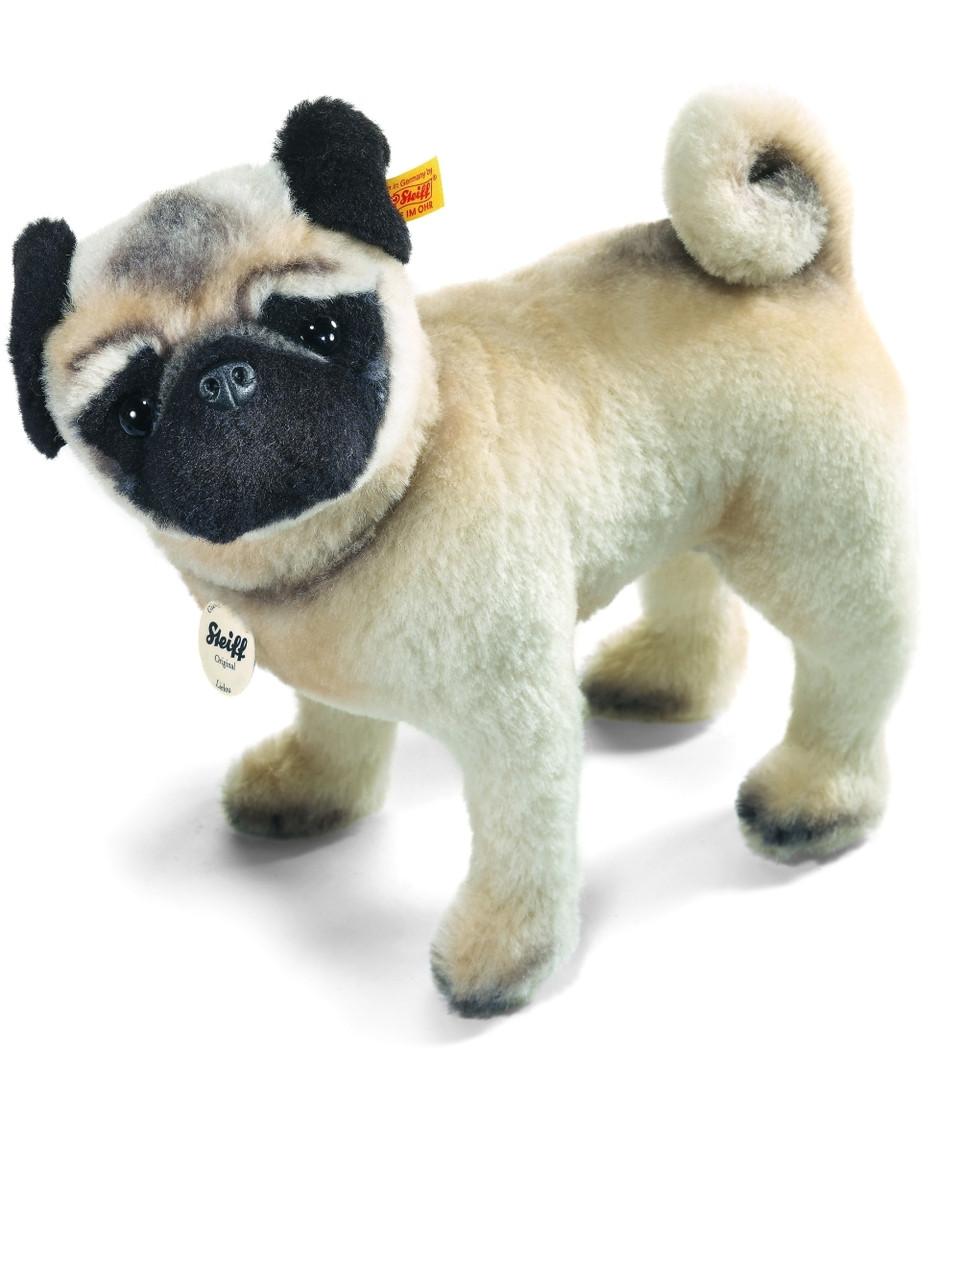 Stuffed Animals Pug Dog Lielou Steiff Ean 045042